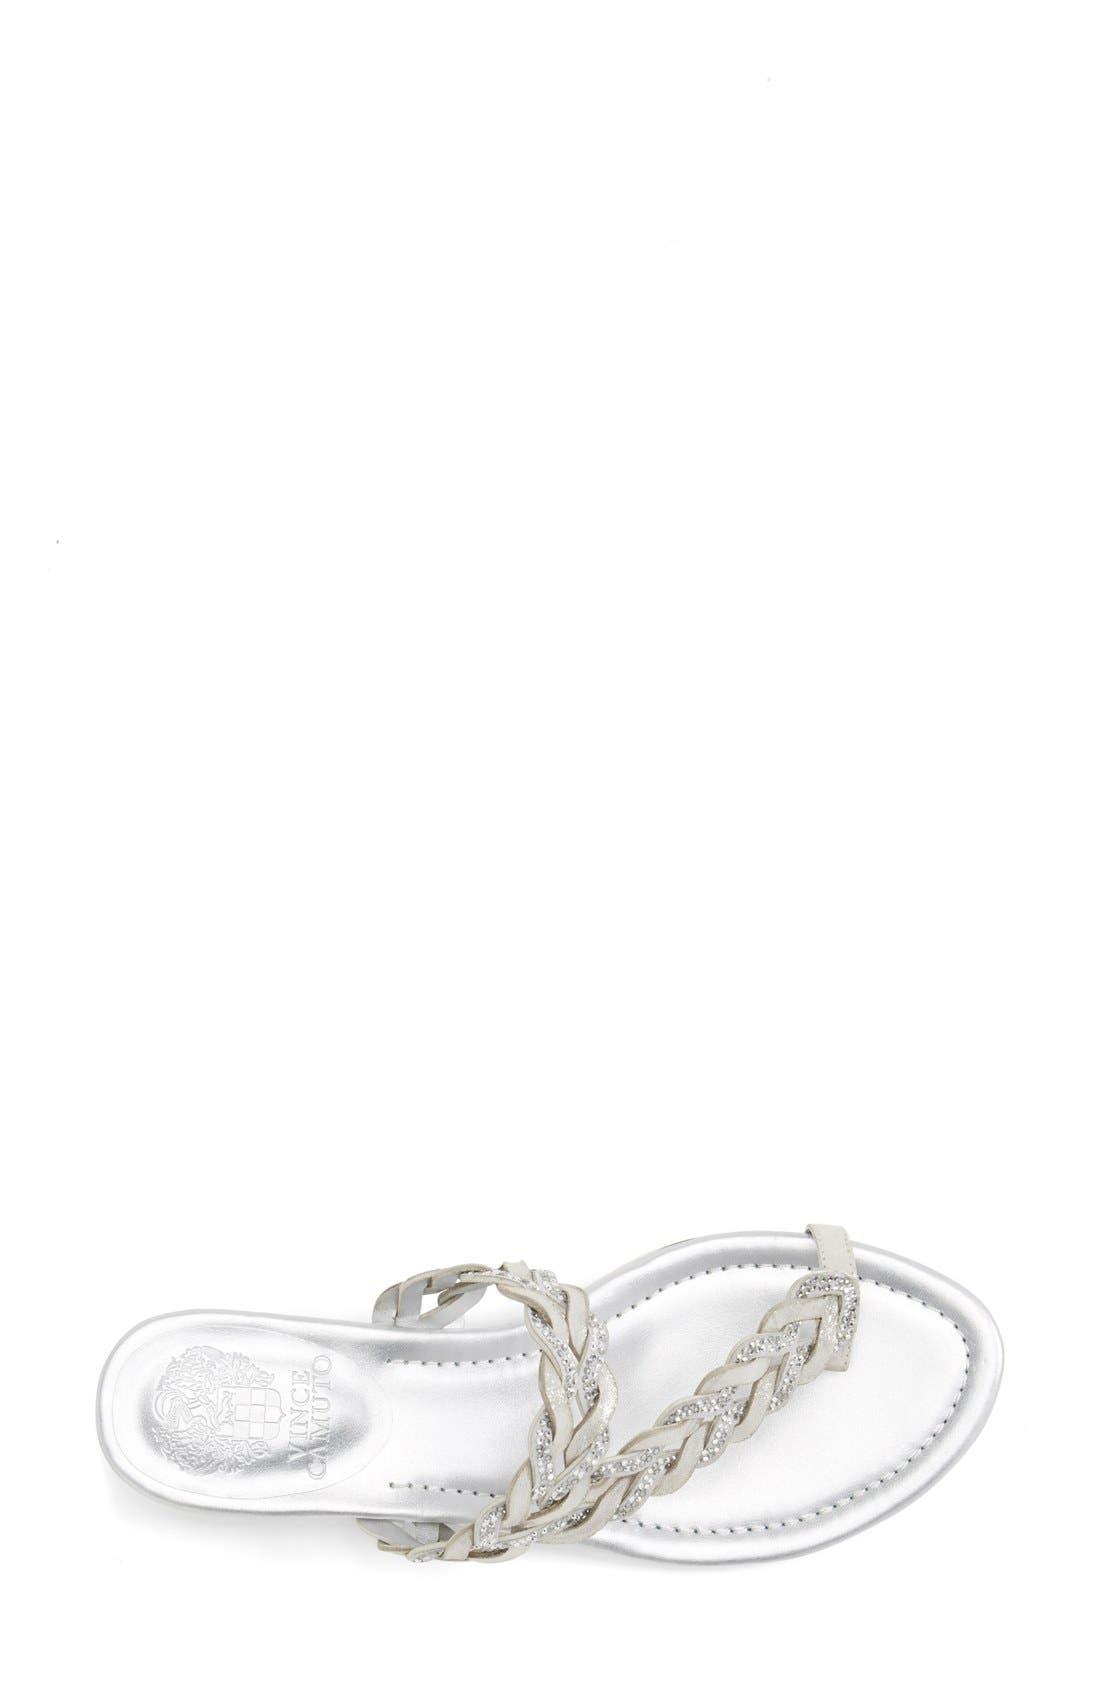 Alternate Image 3  - Vince Camuto 'Imora' Braided Thong Sandal (Women)